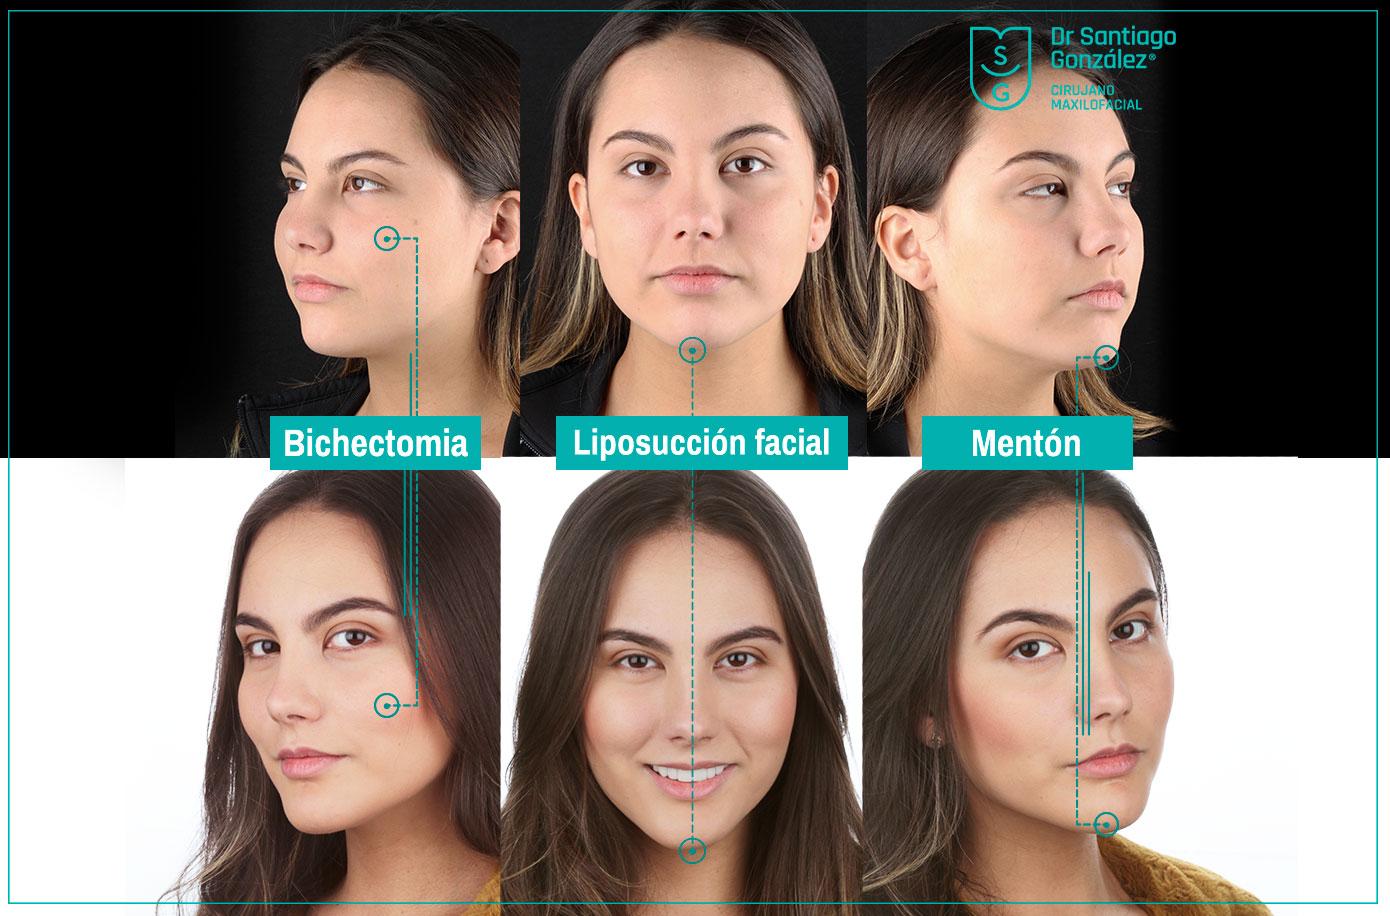 santiago-gonzalez-marcacion-facial